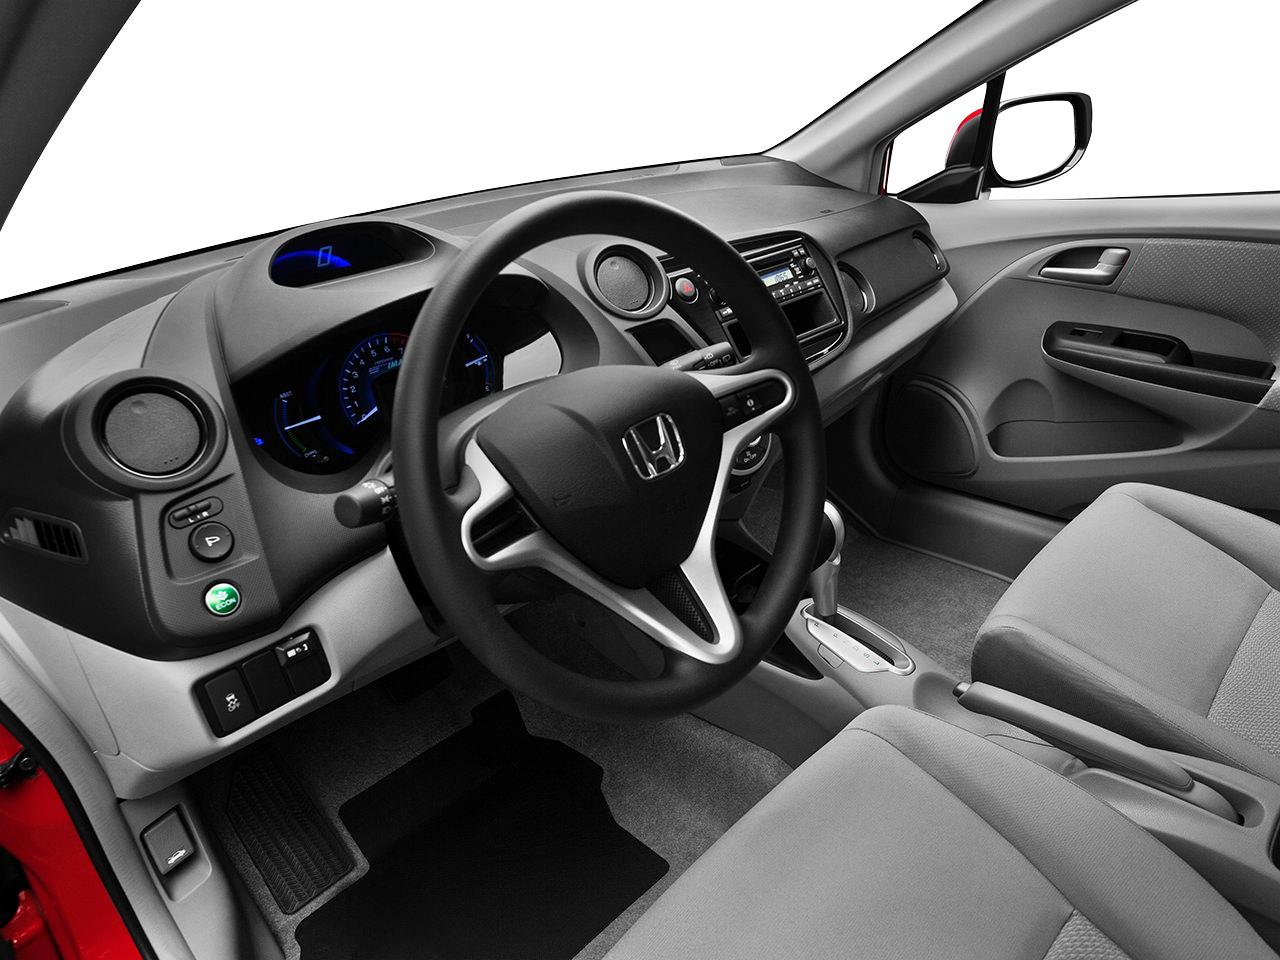 A Buyers Guide to the 2012 Honda Insight – Honda Insight Fuse Box Location